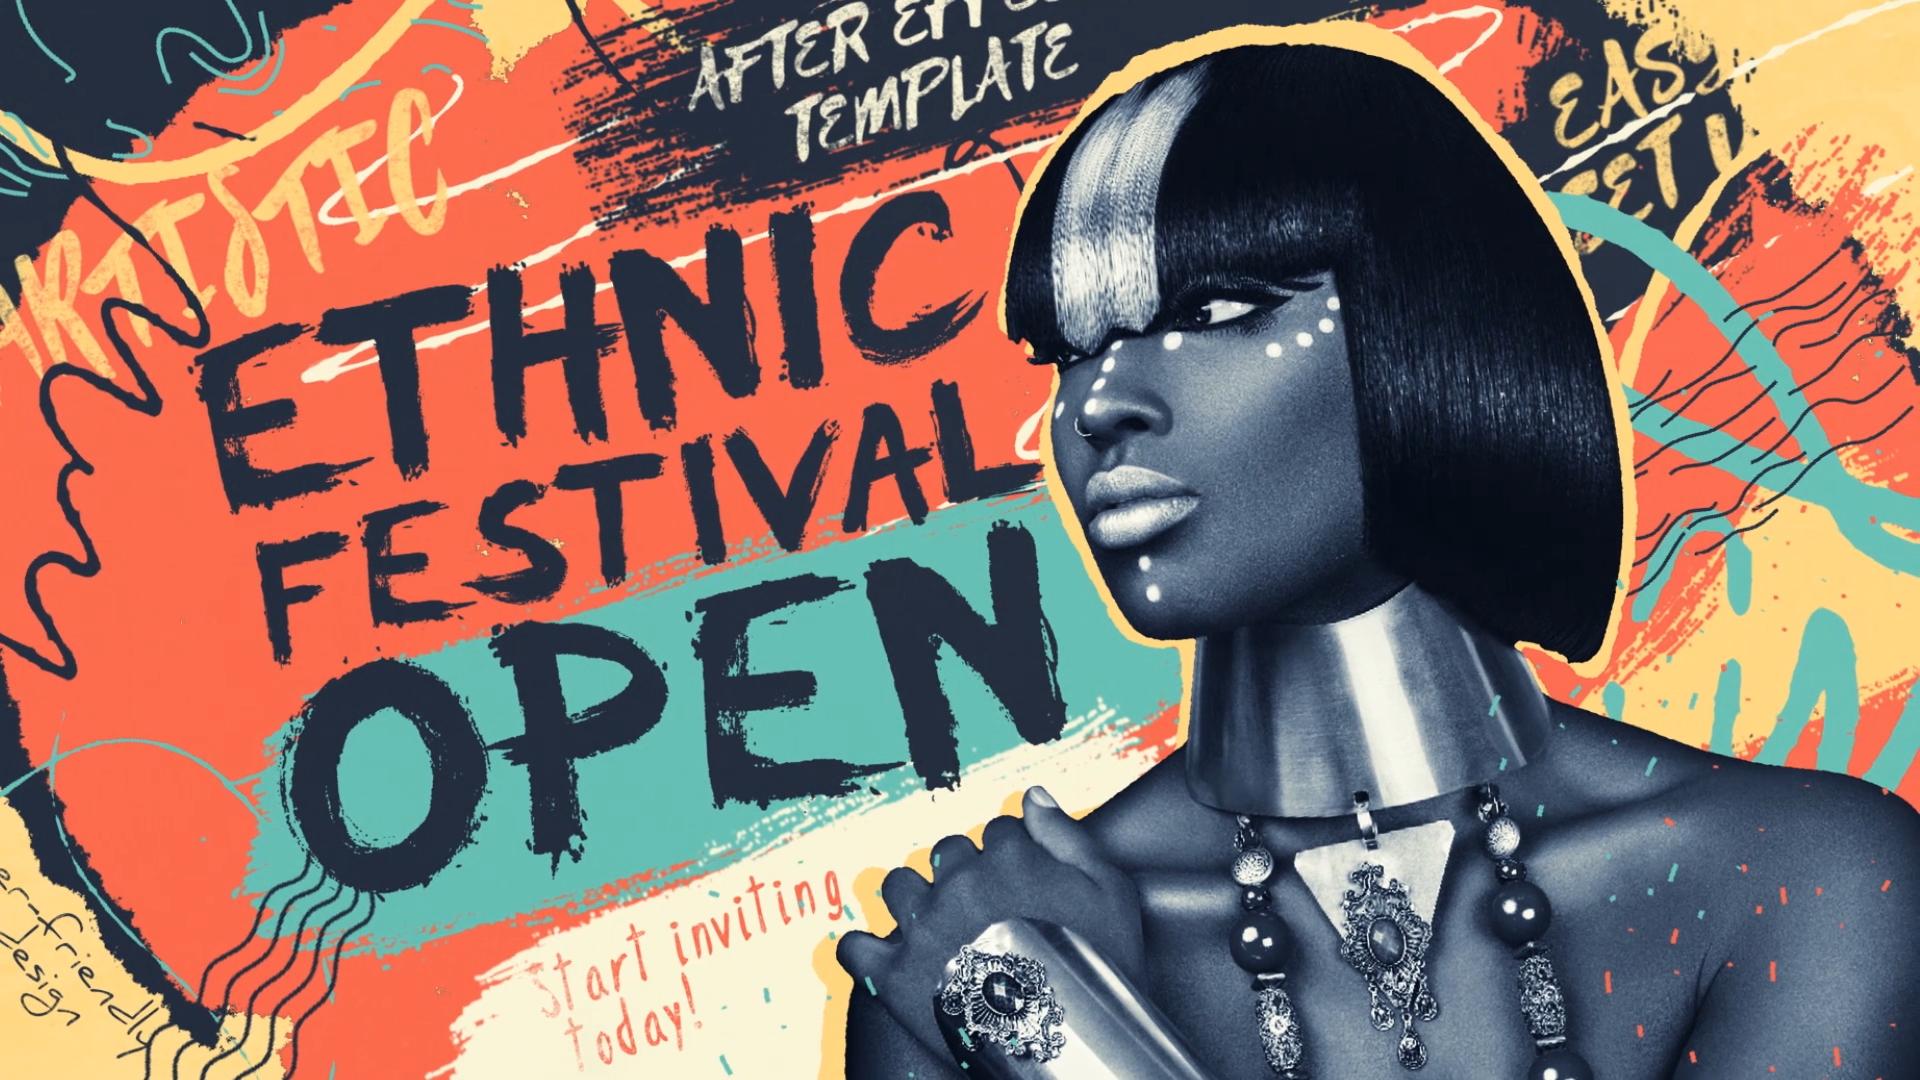 Ethnic_Festival_Open_1080p_02071